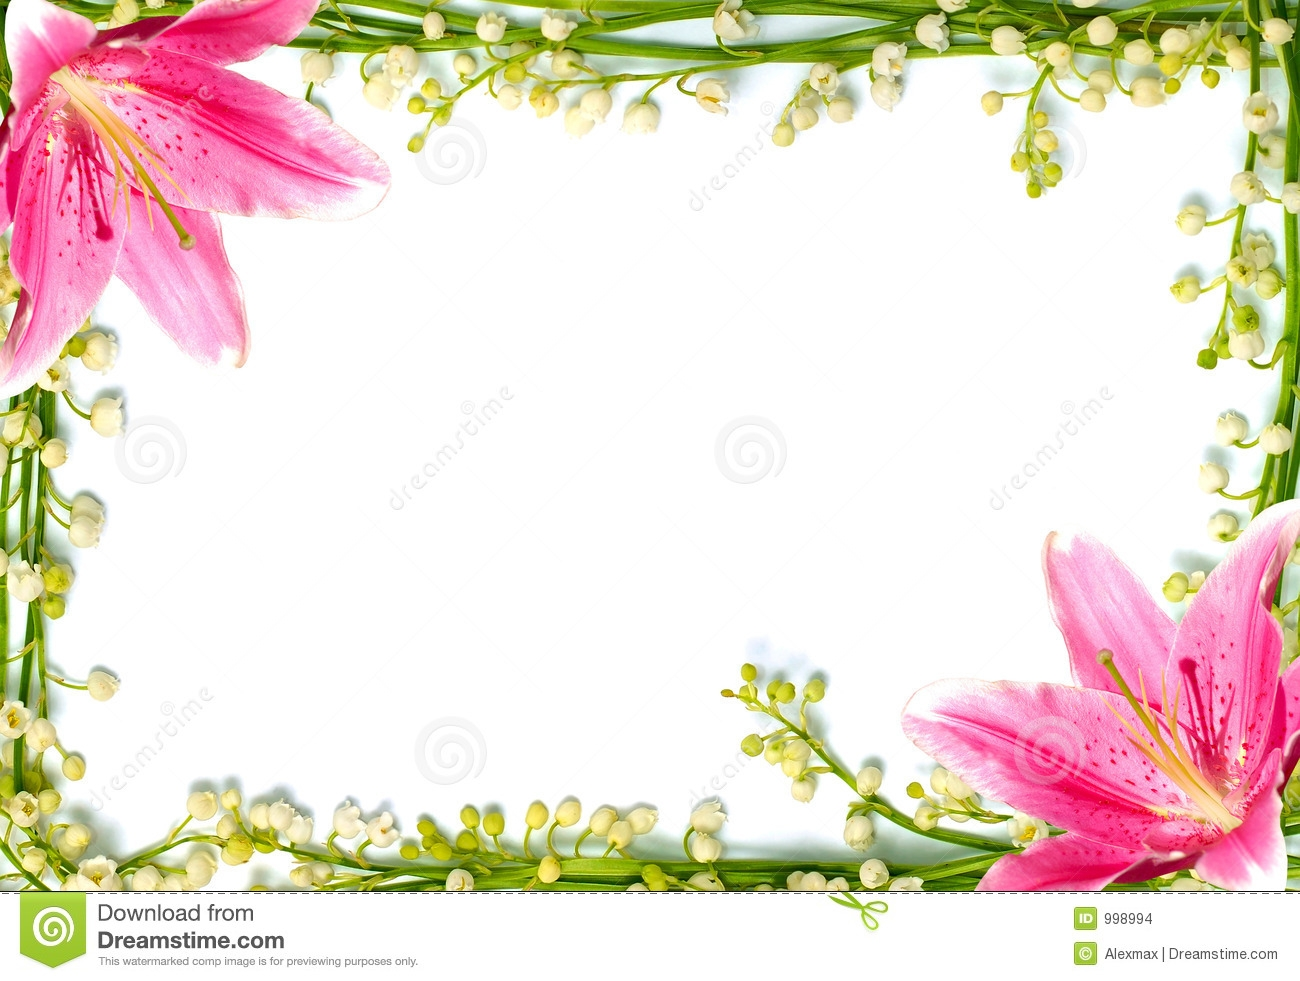 Love Letter Background Hd   clipartsgramcom 1300x981